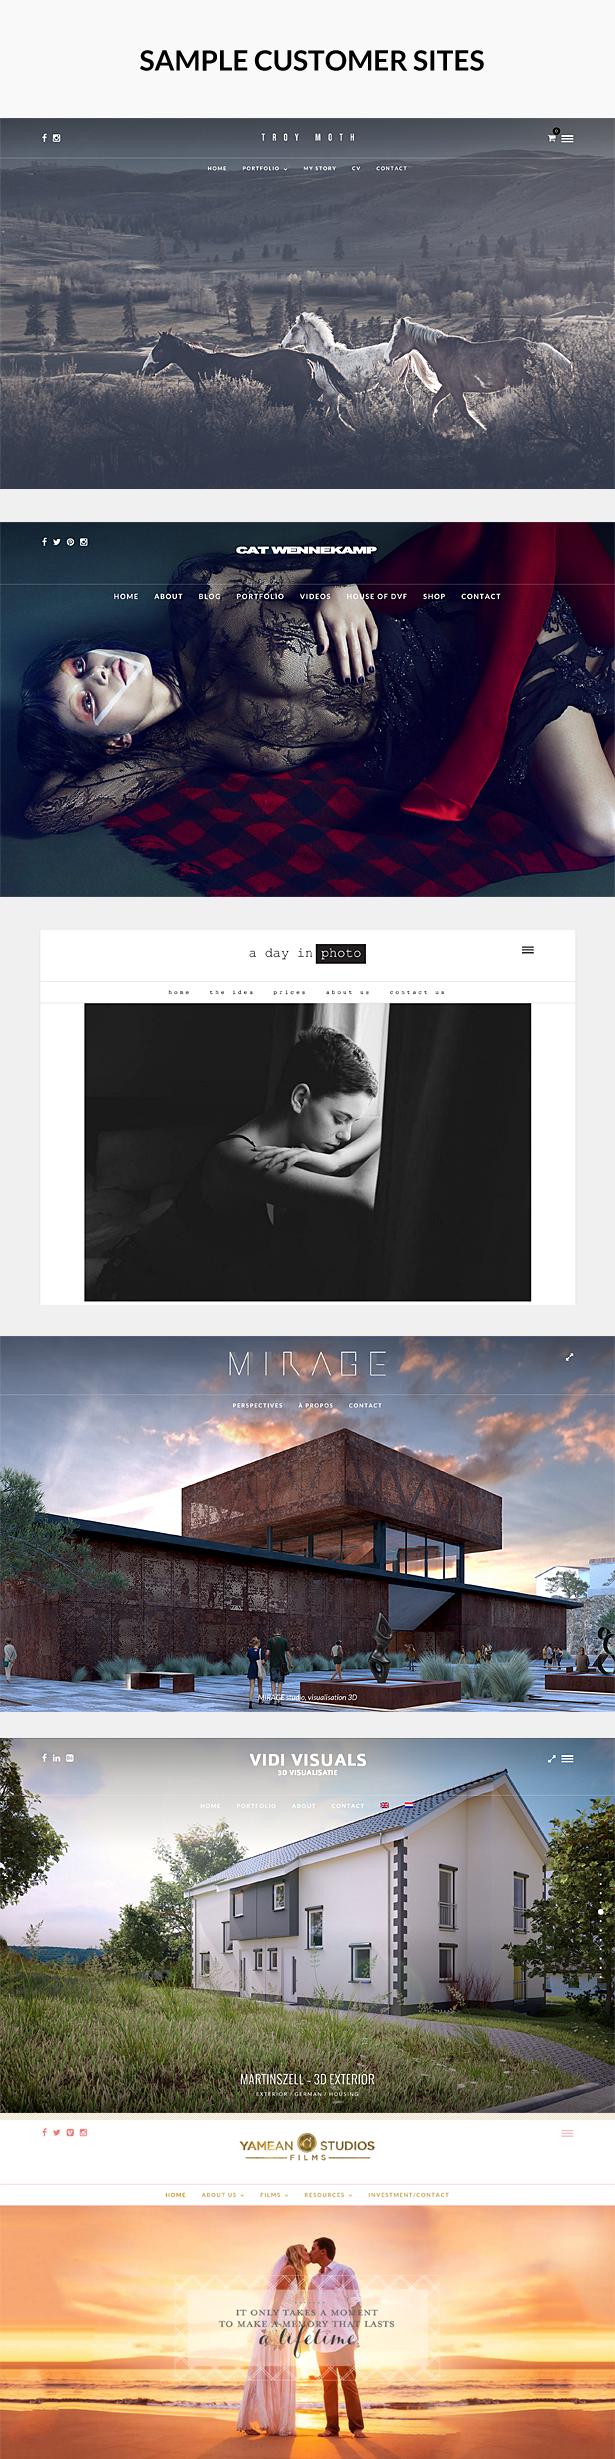 photome customers2 - PhotoMe | Portfolio WordPress